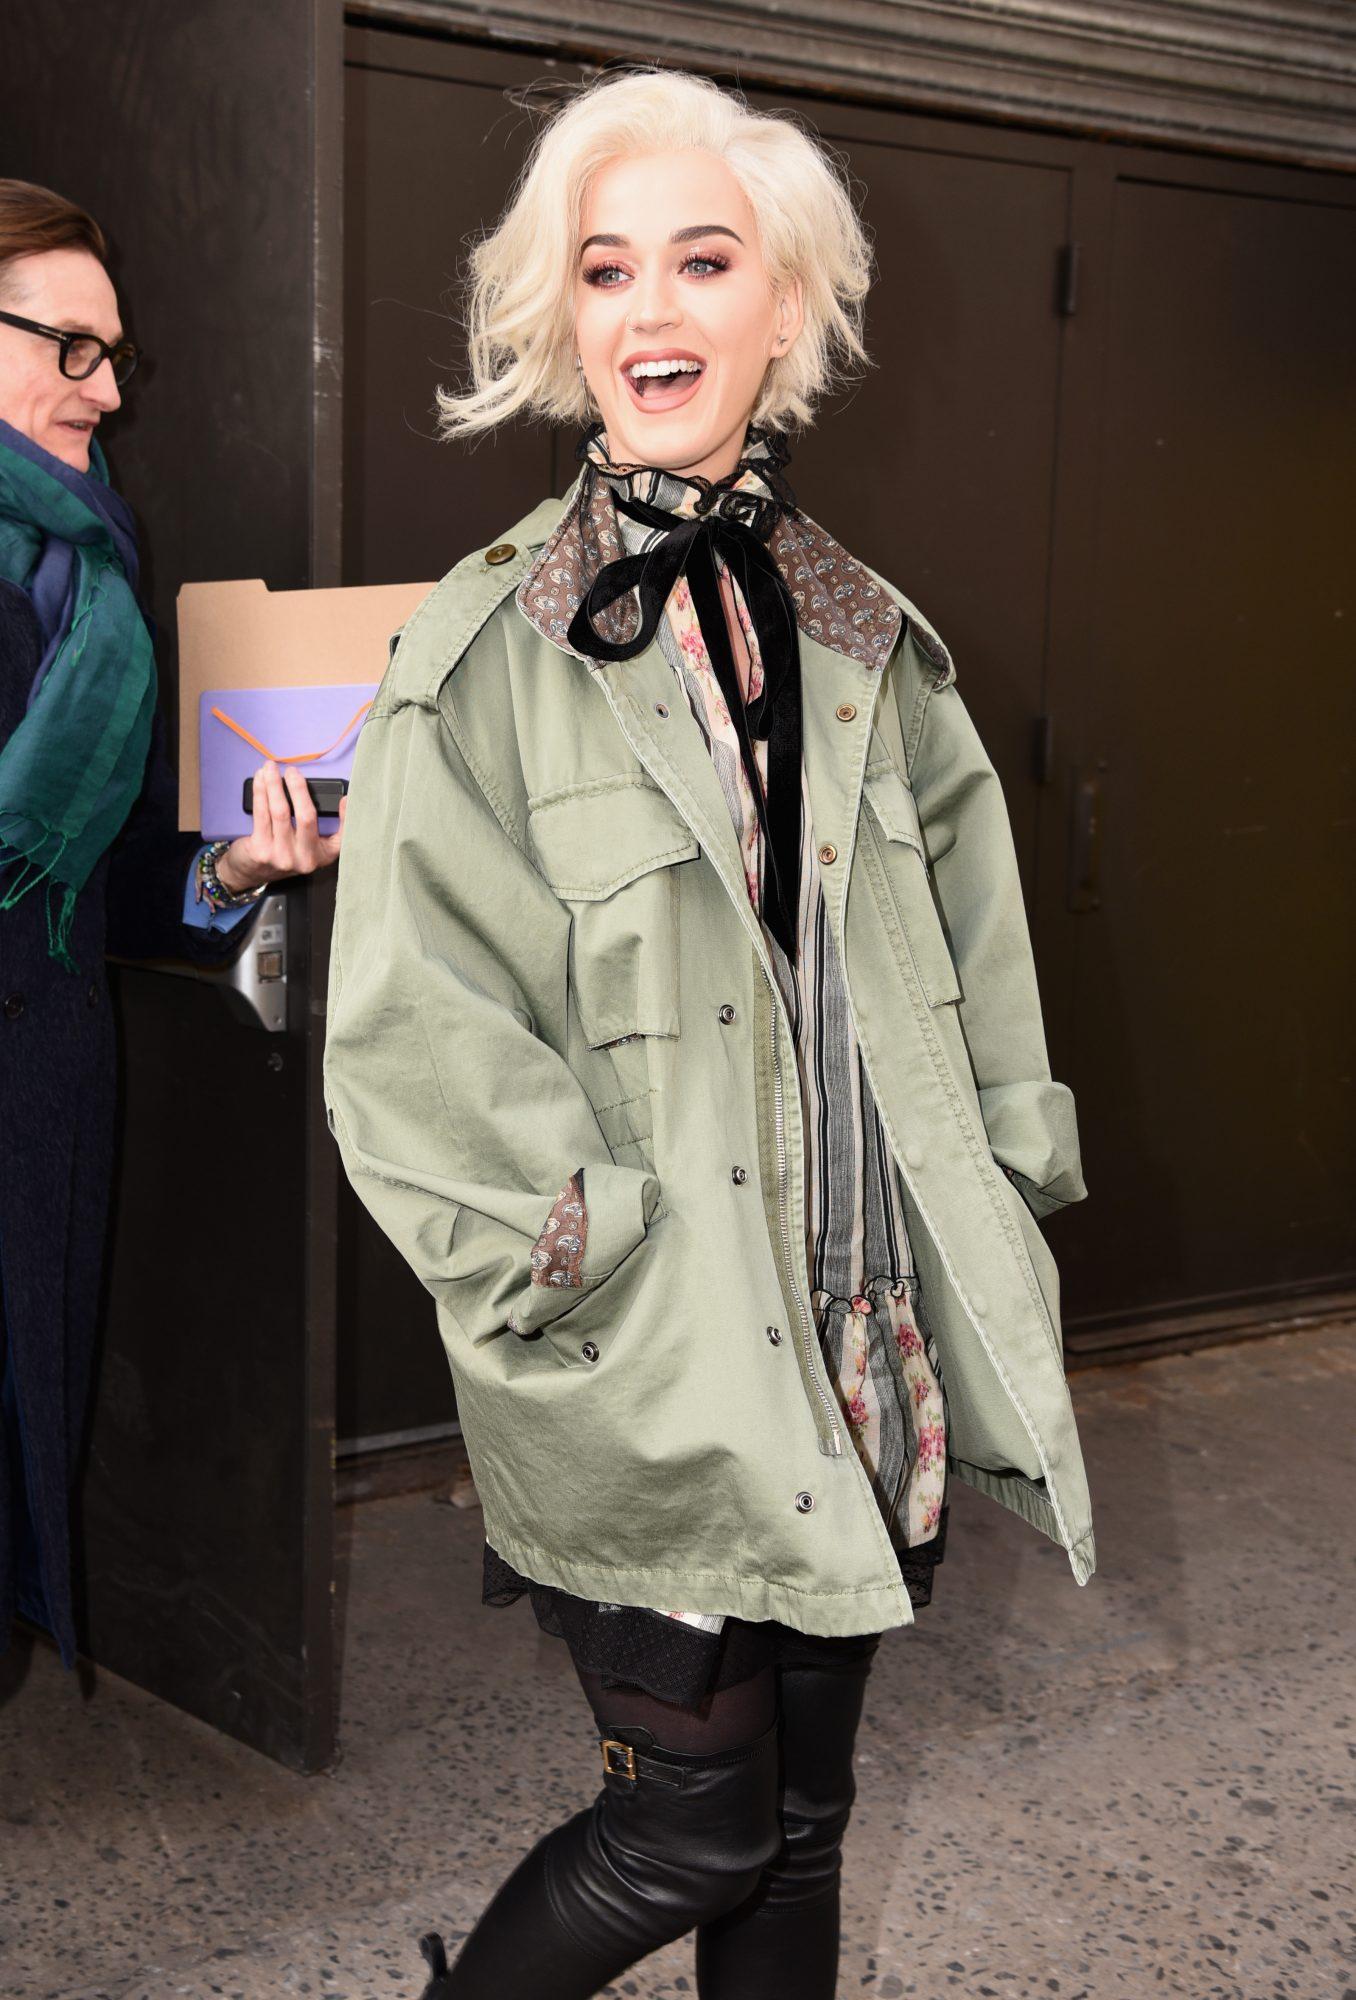 Katy-smiling.jpg